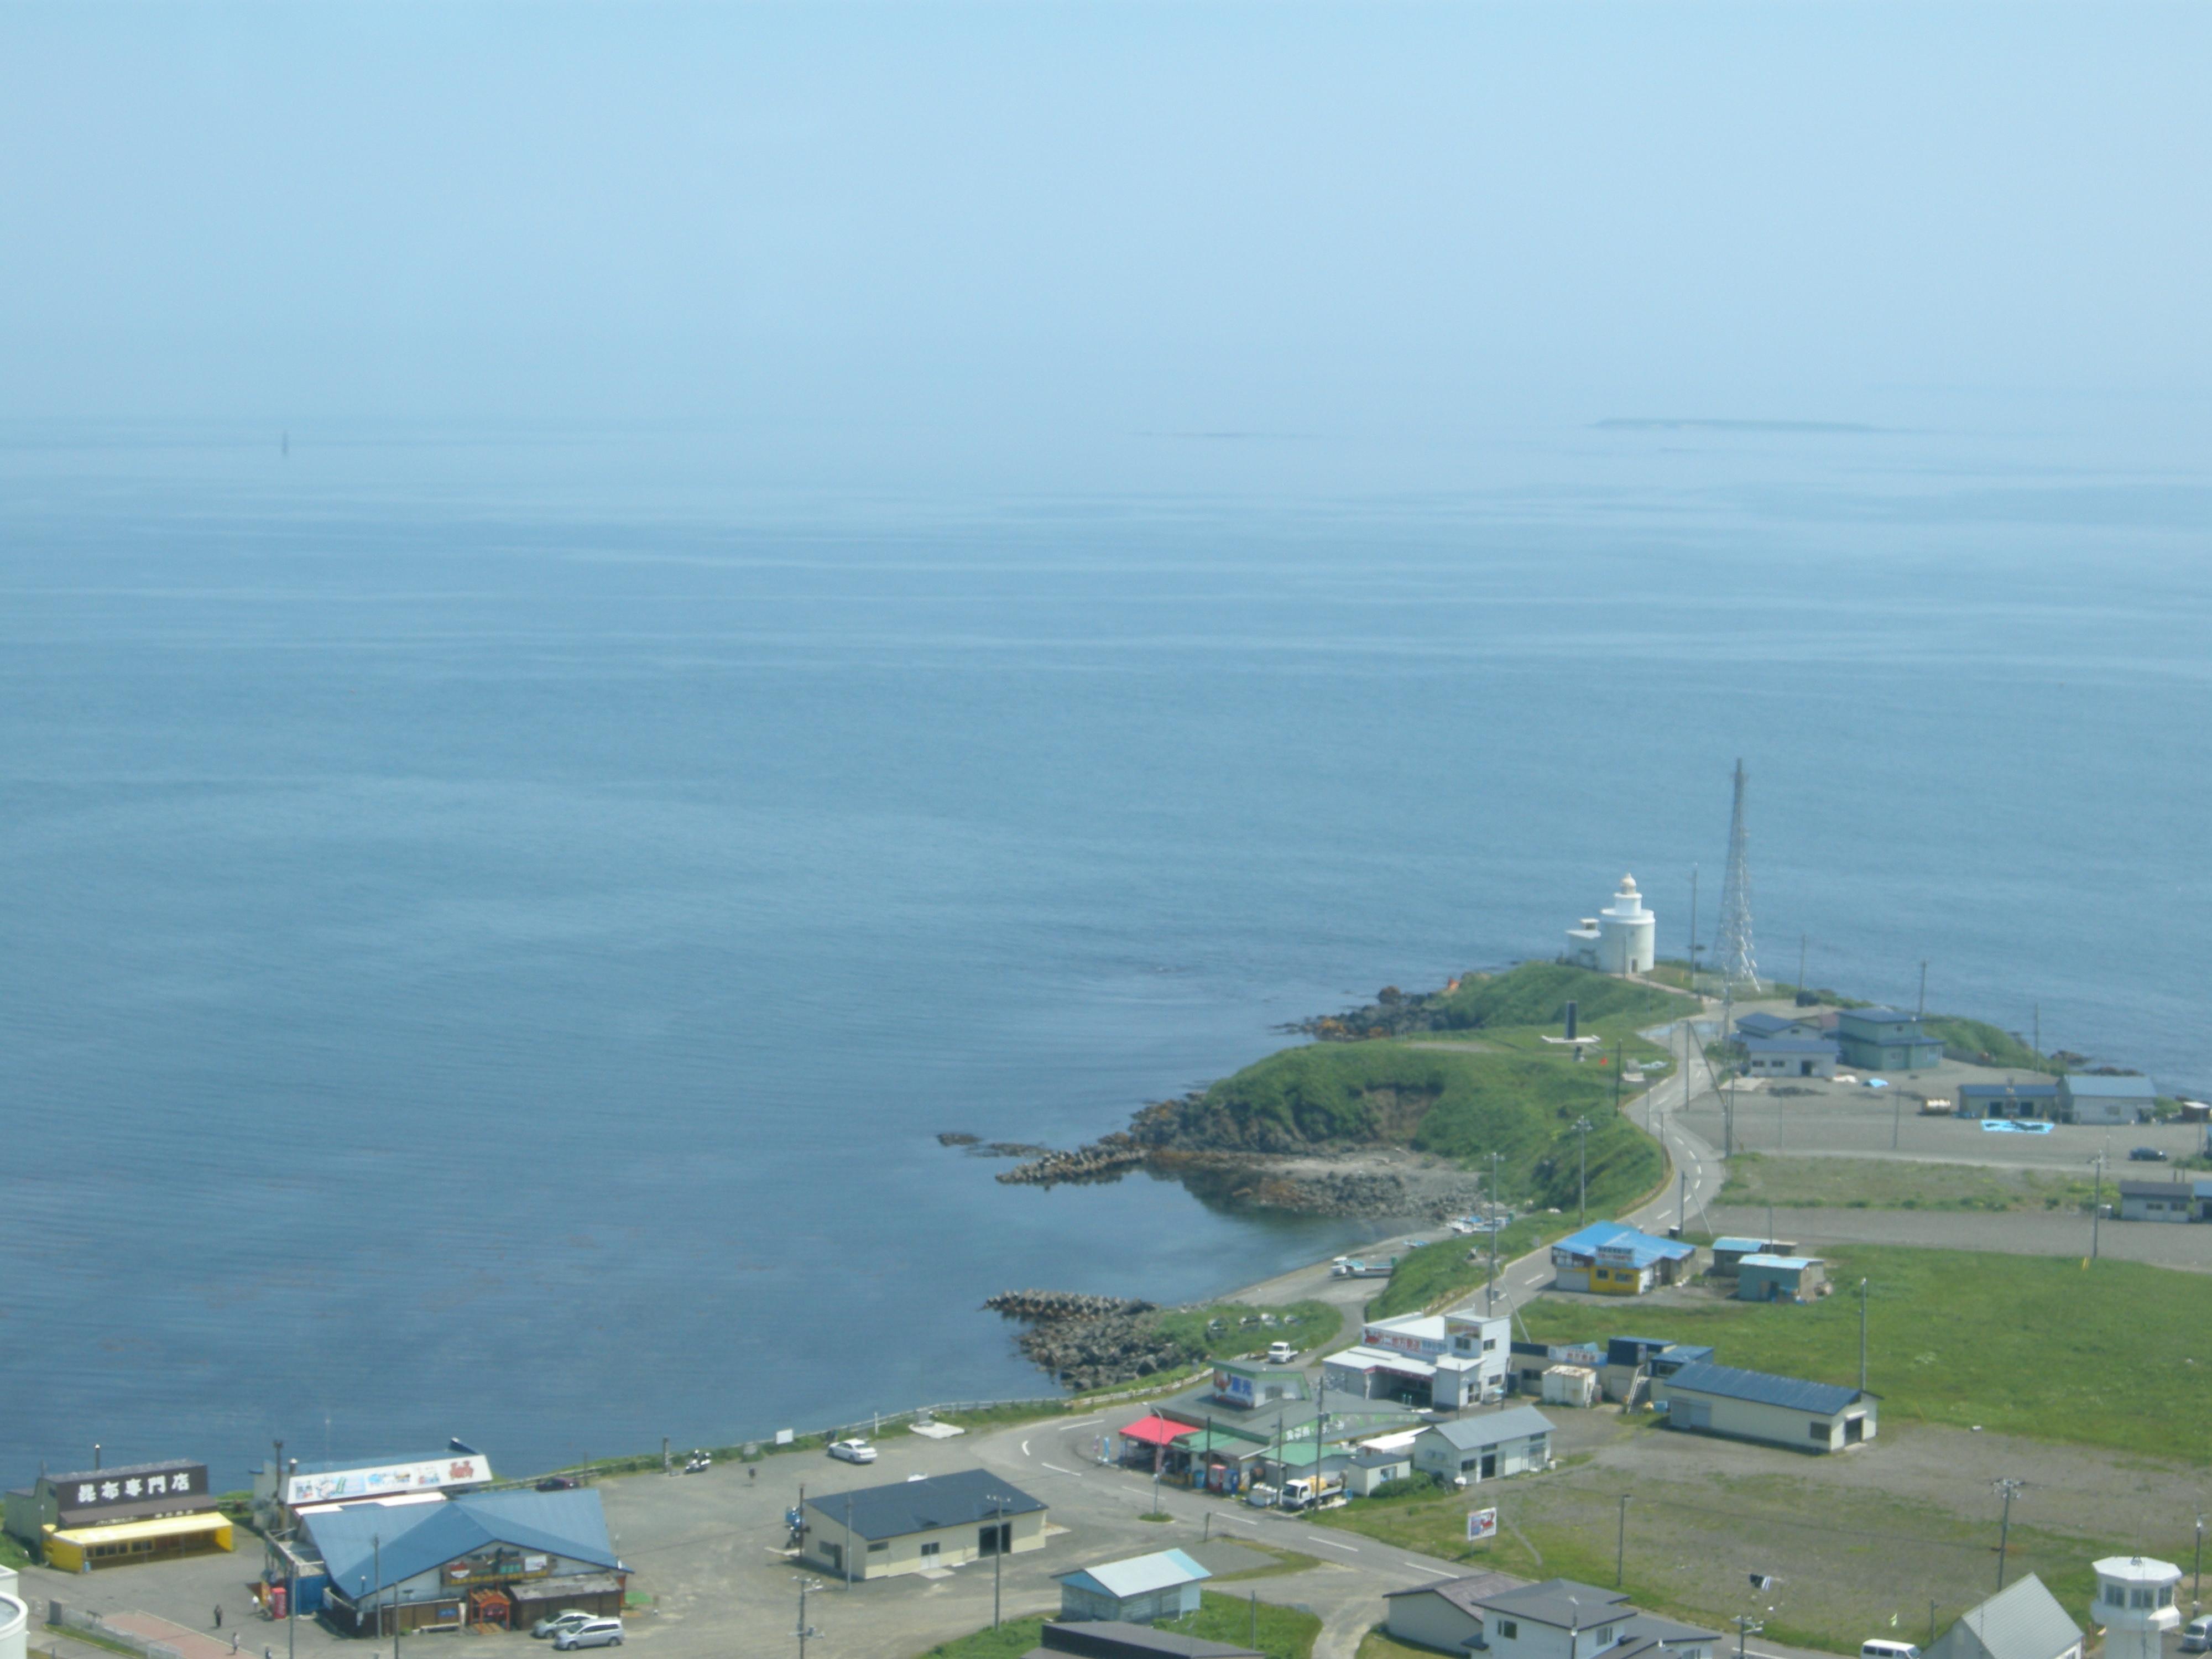 Dscn Lonely Island Imdb